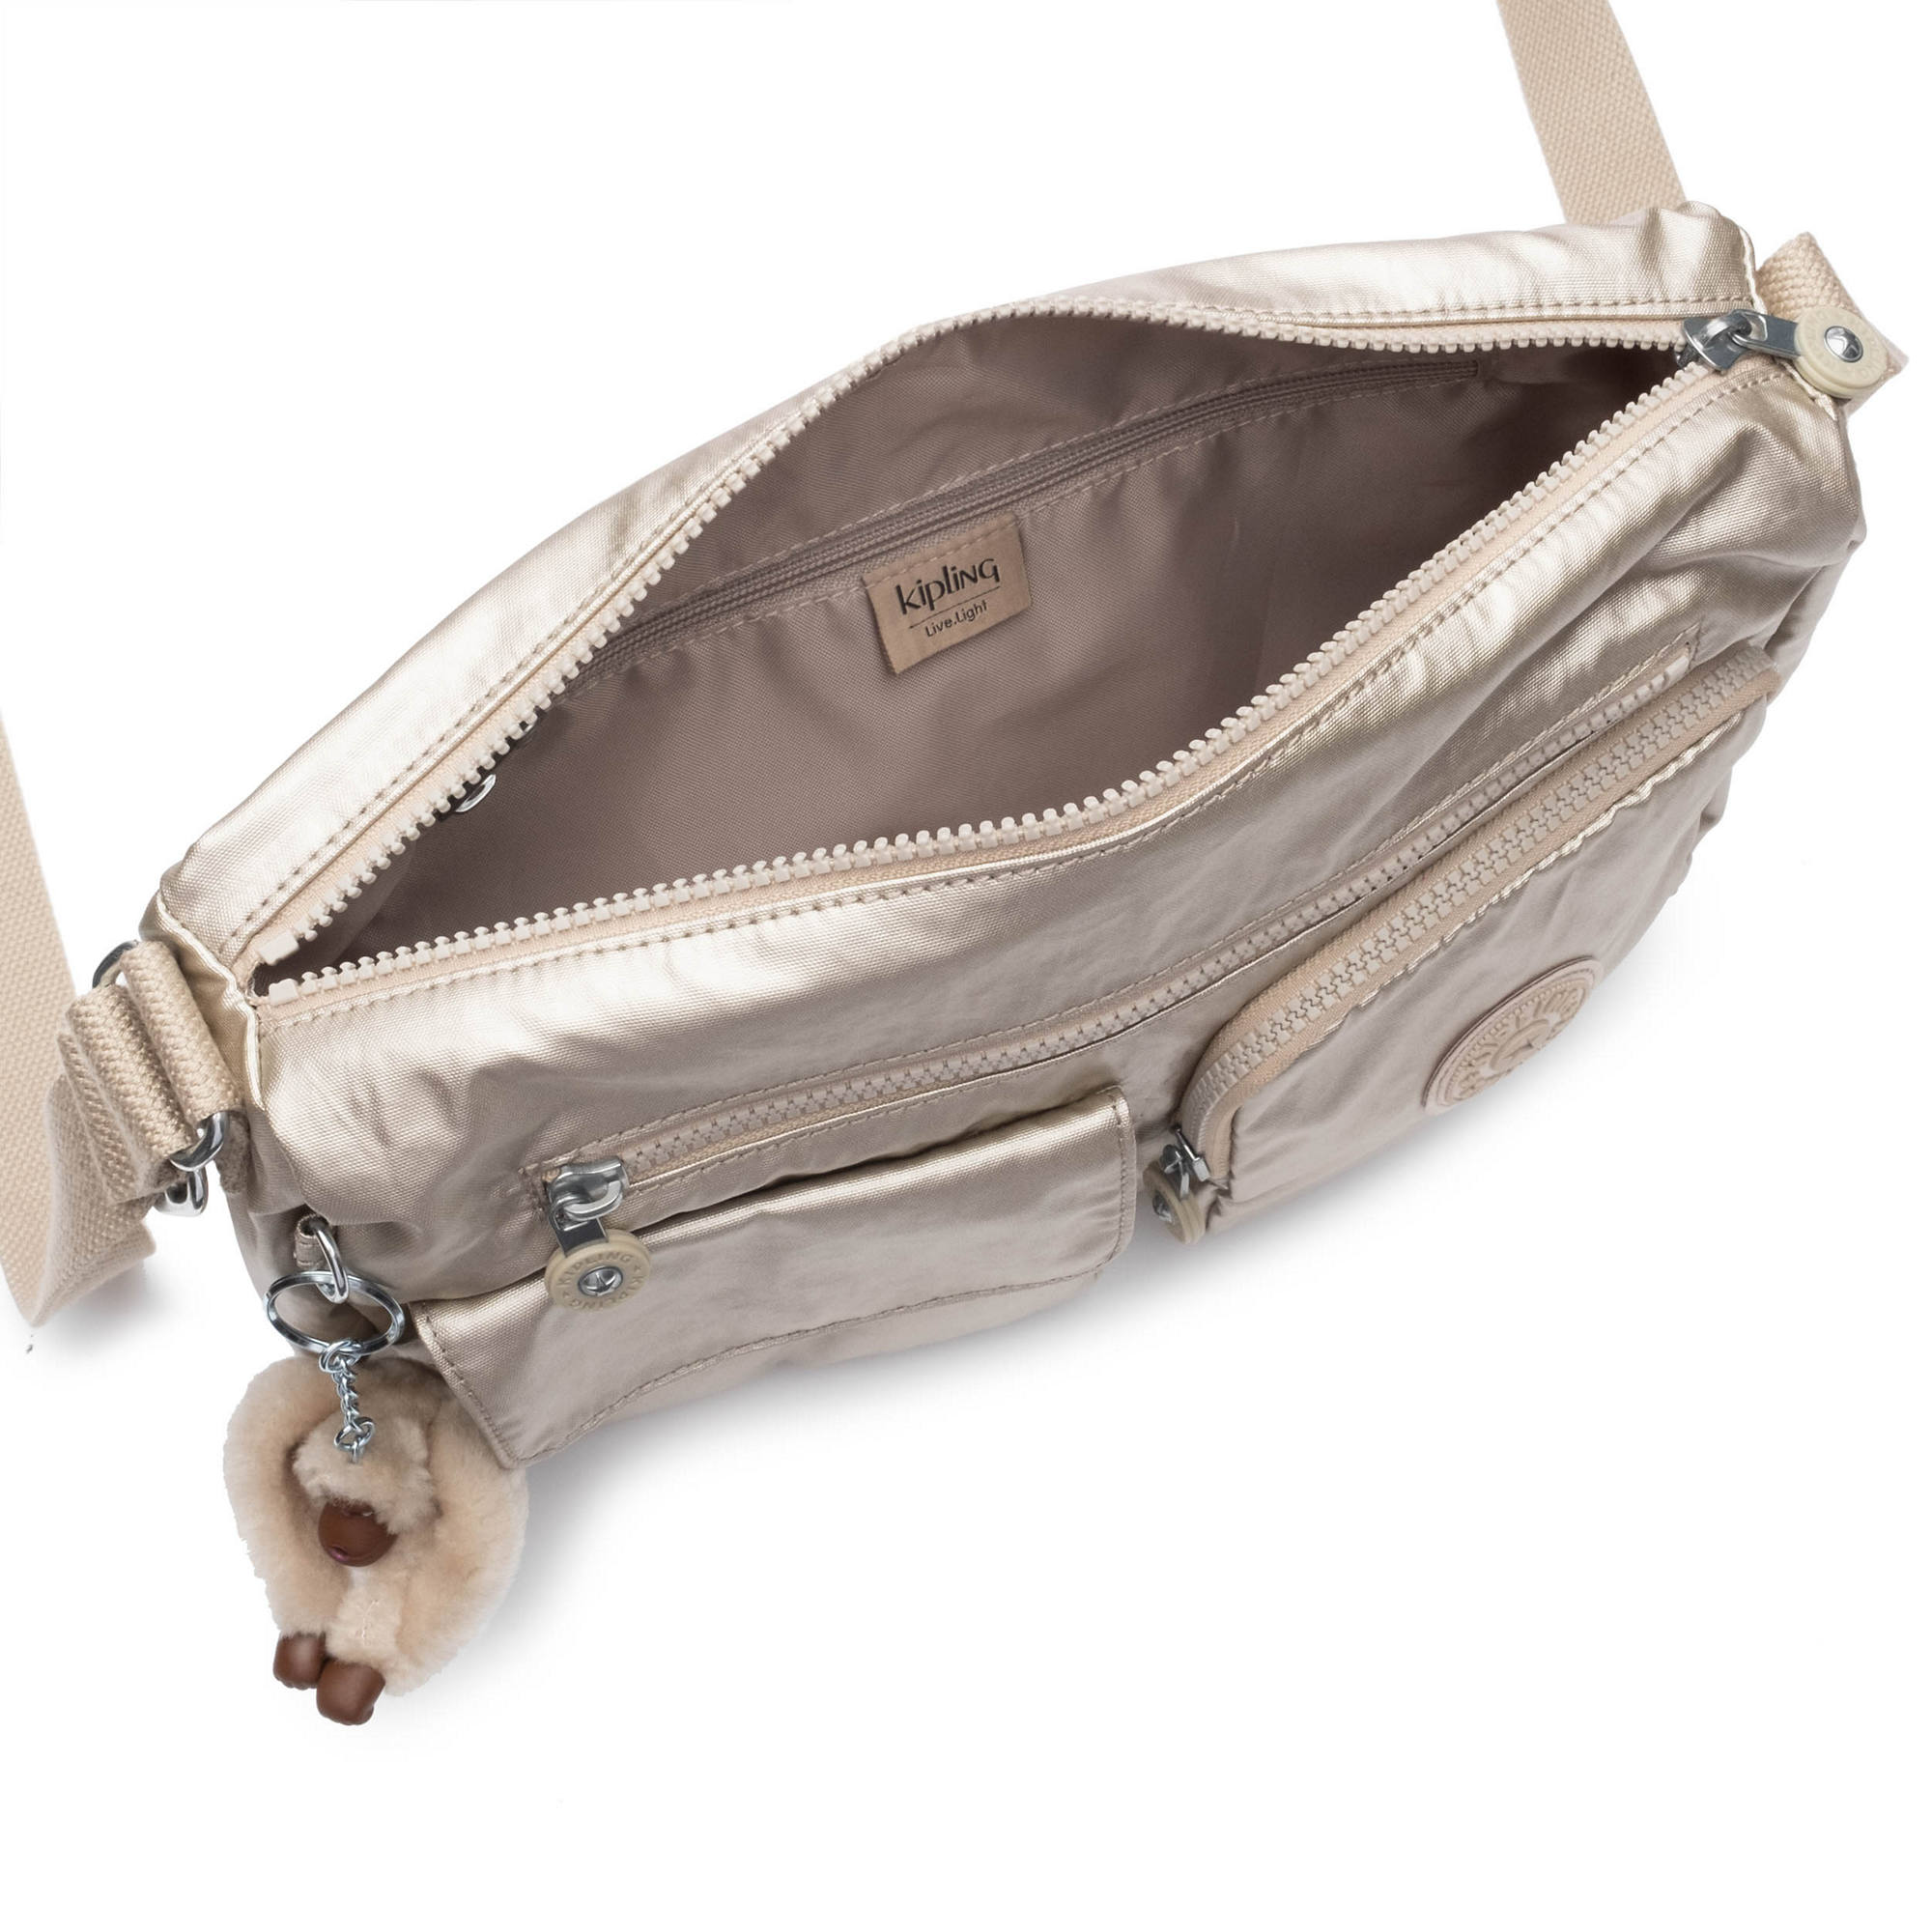 Jean Crossbody Bag,Gleaming Gold Metallic,large-zoomed